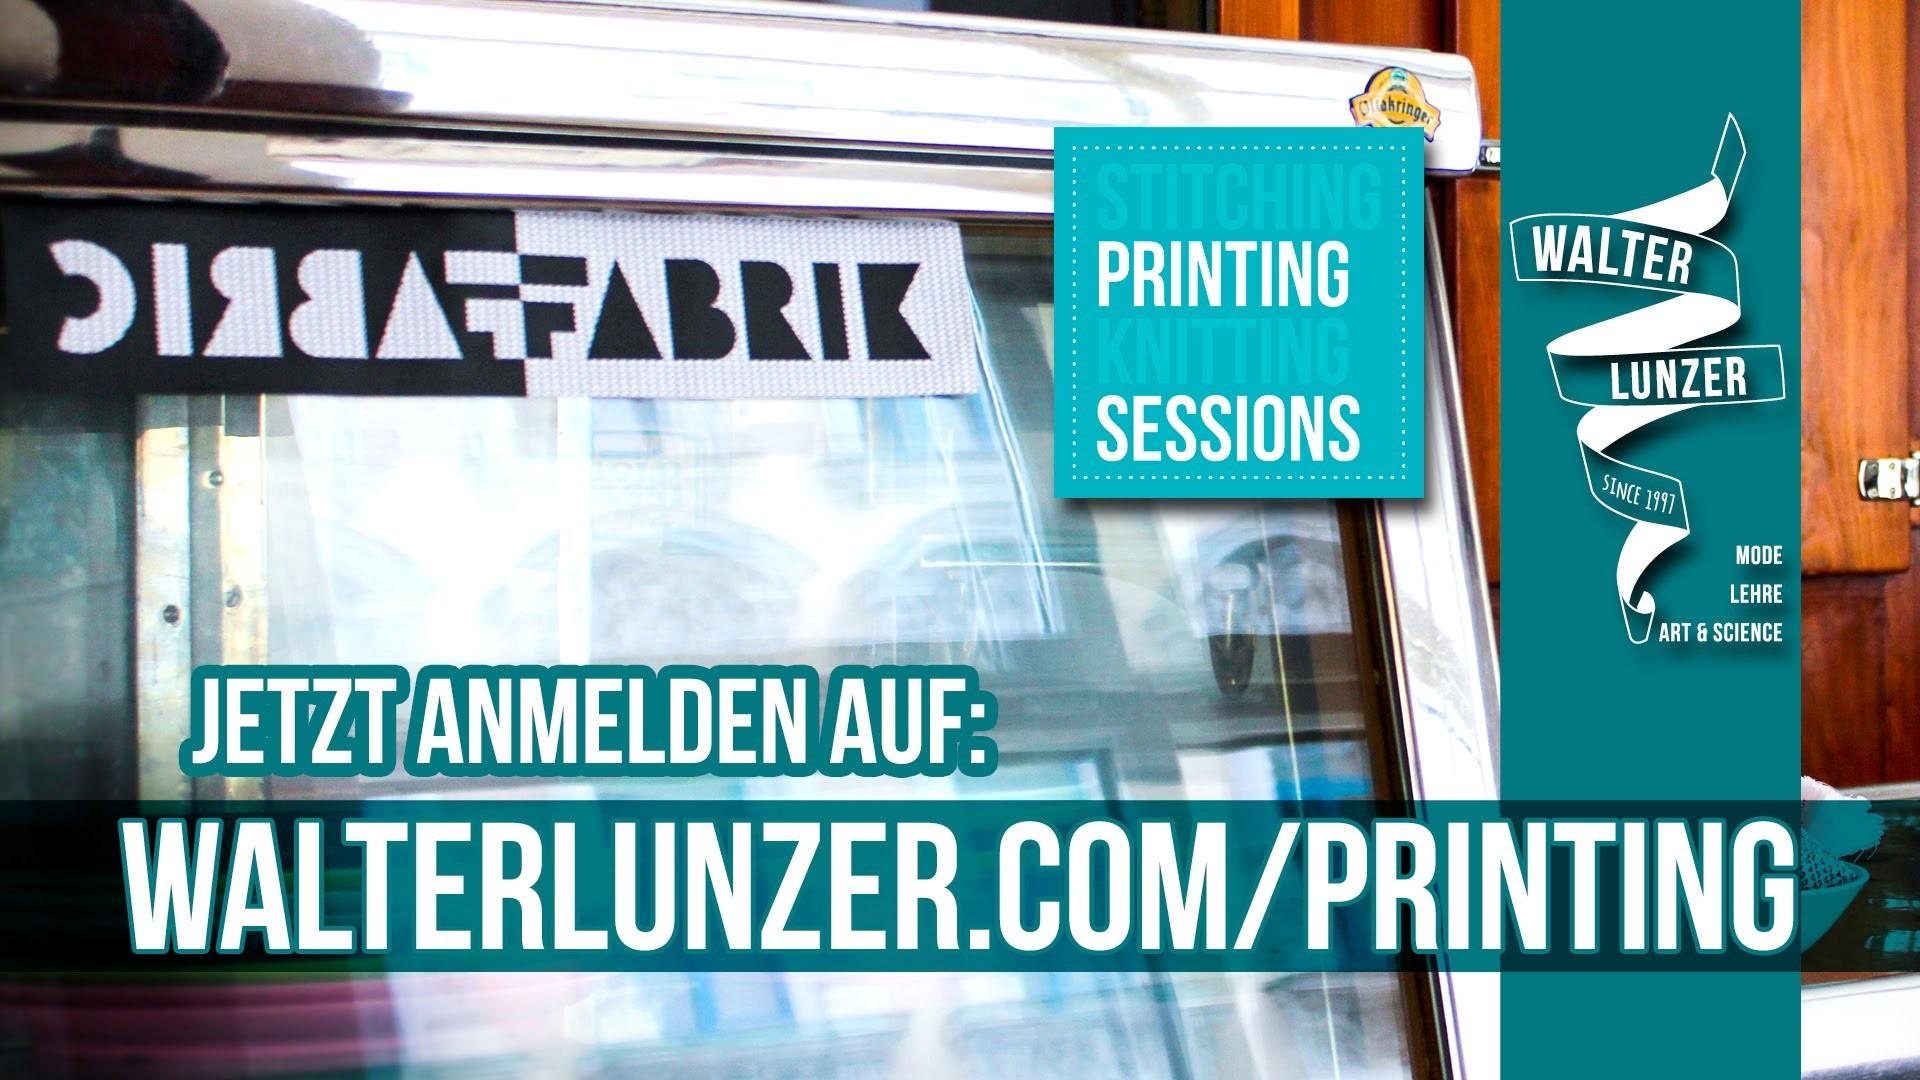 Printing Sessions - DIY Siebdruck - walterlunzer.com & FabricFabrik